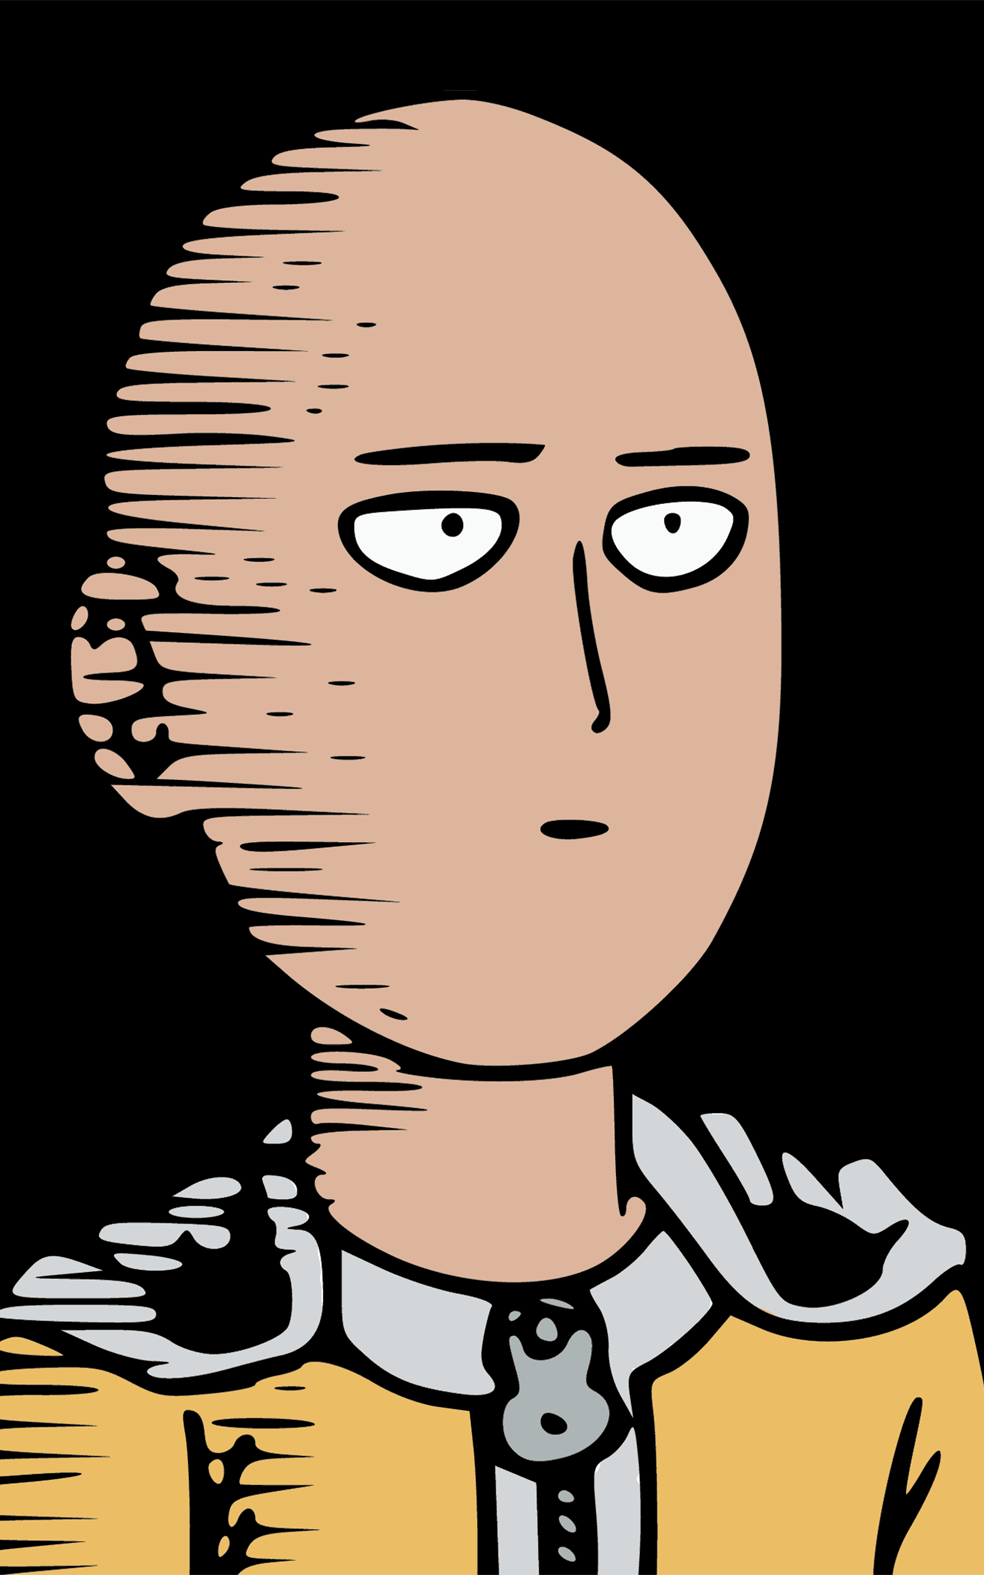 Saitama Seni Anime Gambar Serigala Animasi